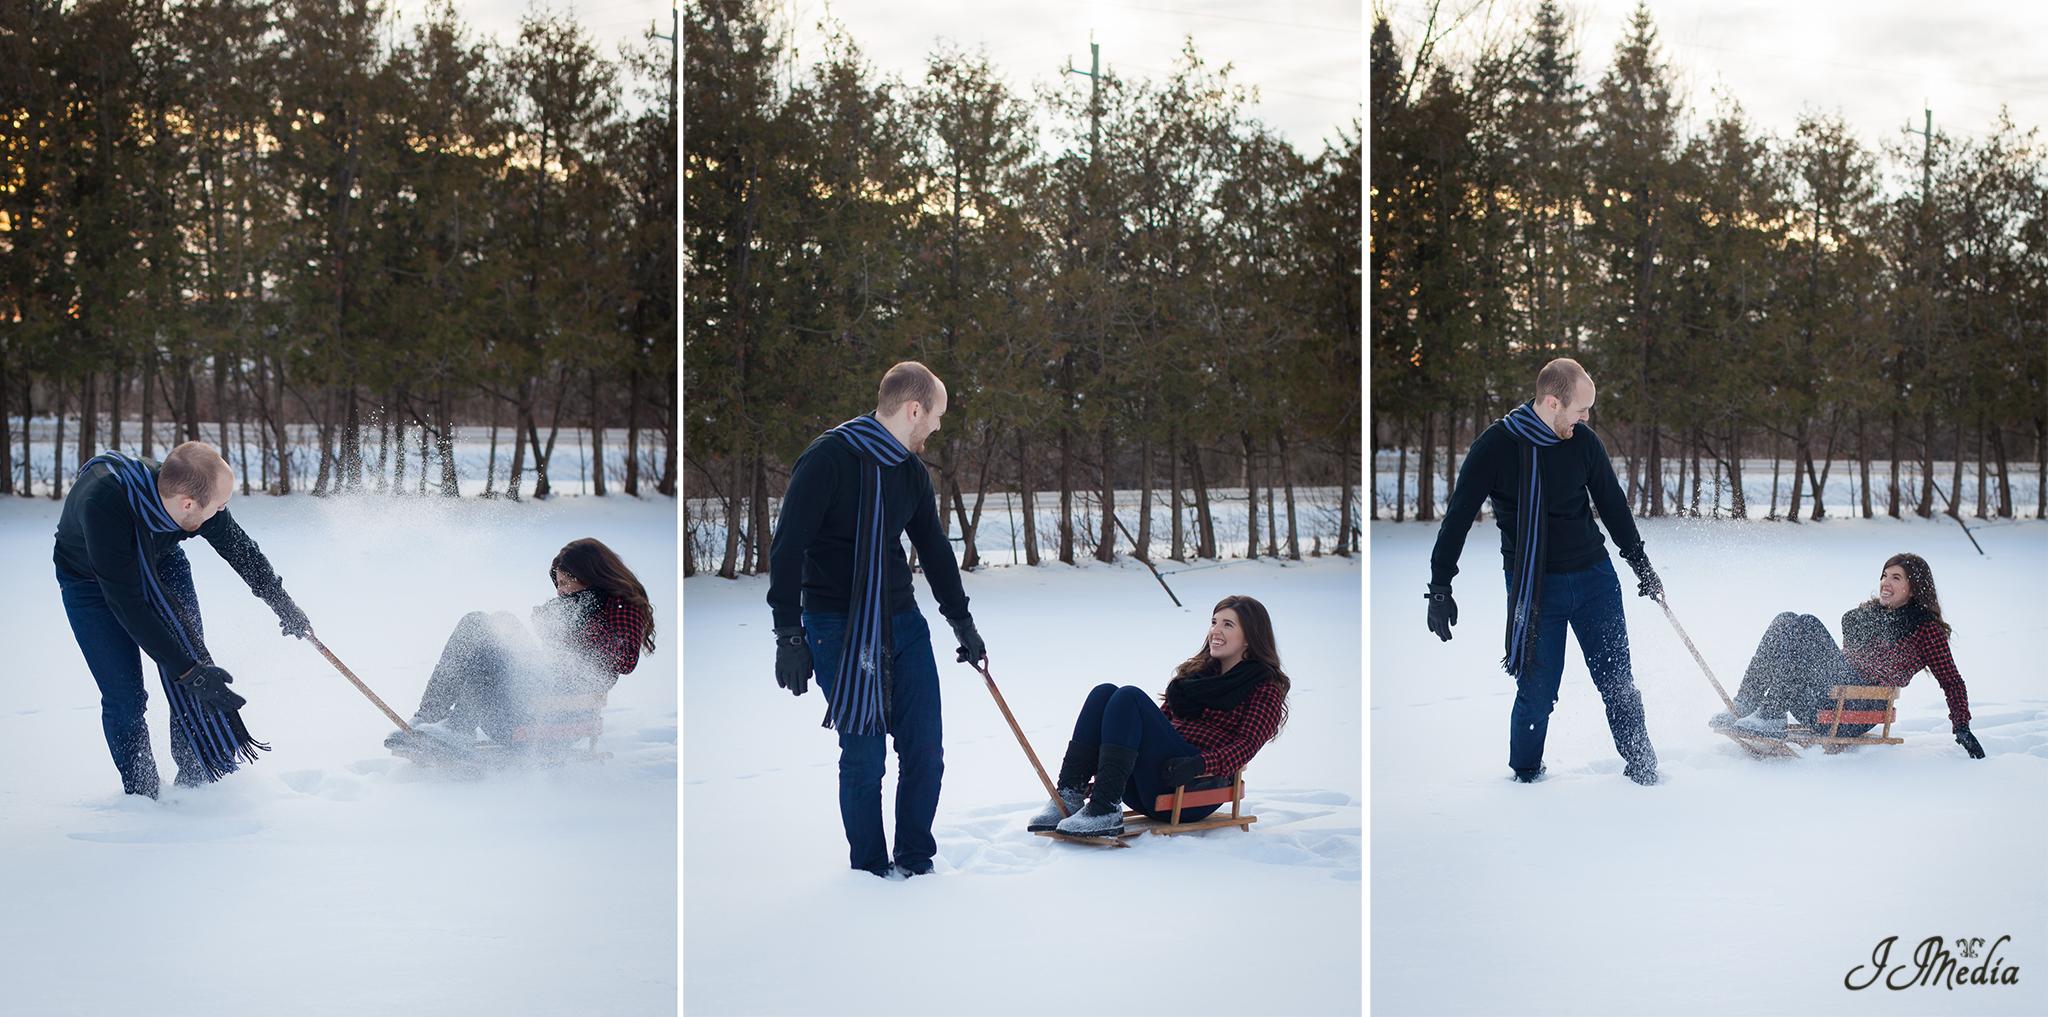 Winter-Engagement-Photos-JJMedia-34